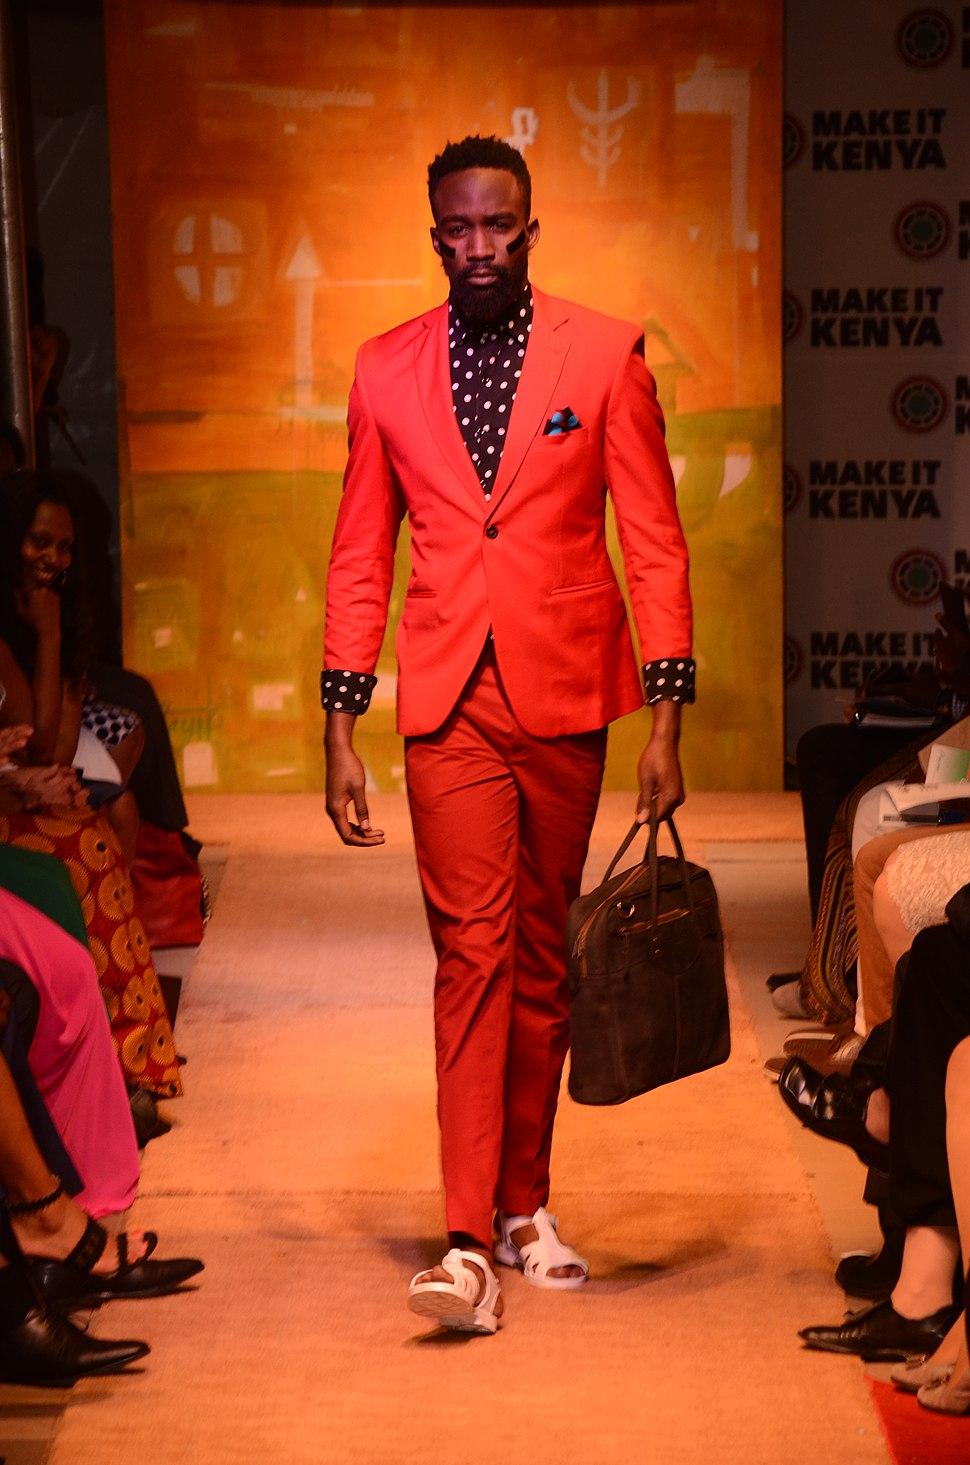 Men's Design by John Kaveke - at the Fashion Show (28400768376)